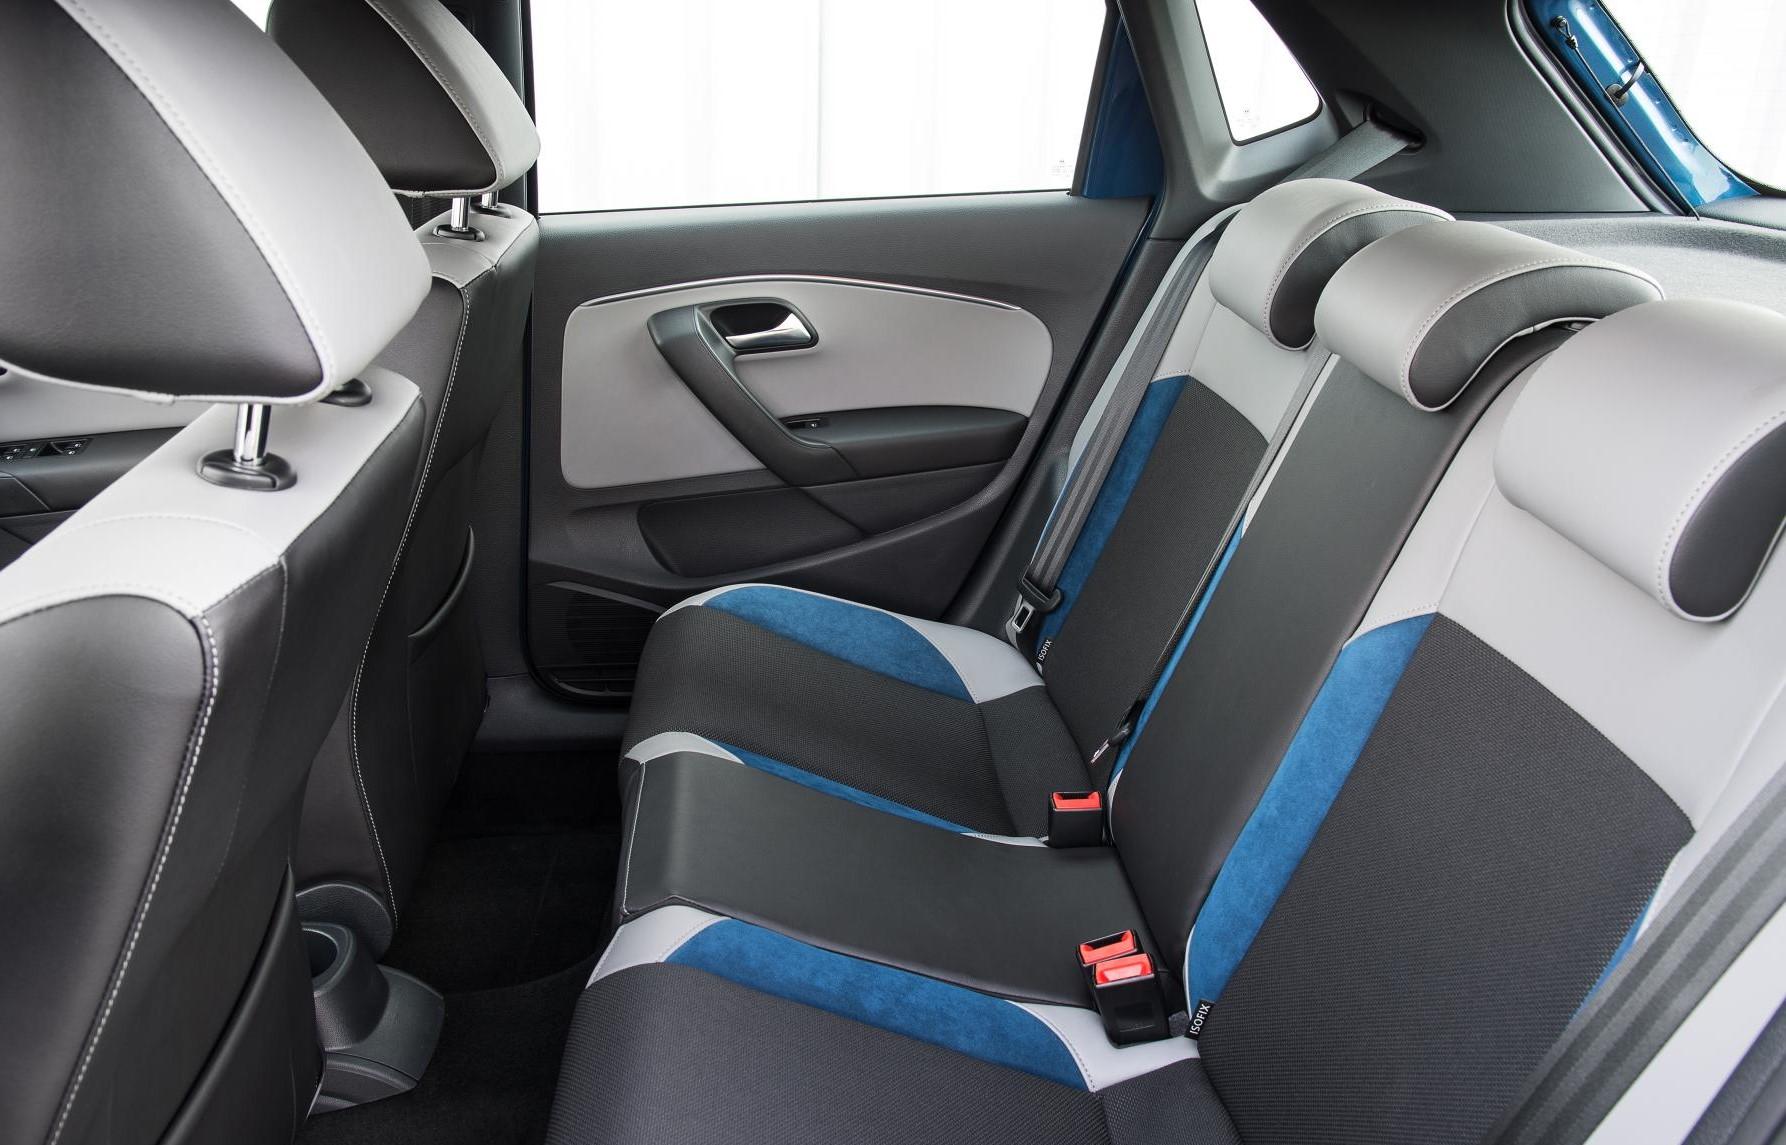 Volkswagen Polo interior back seats